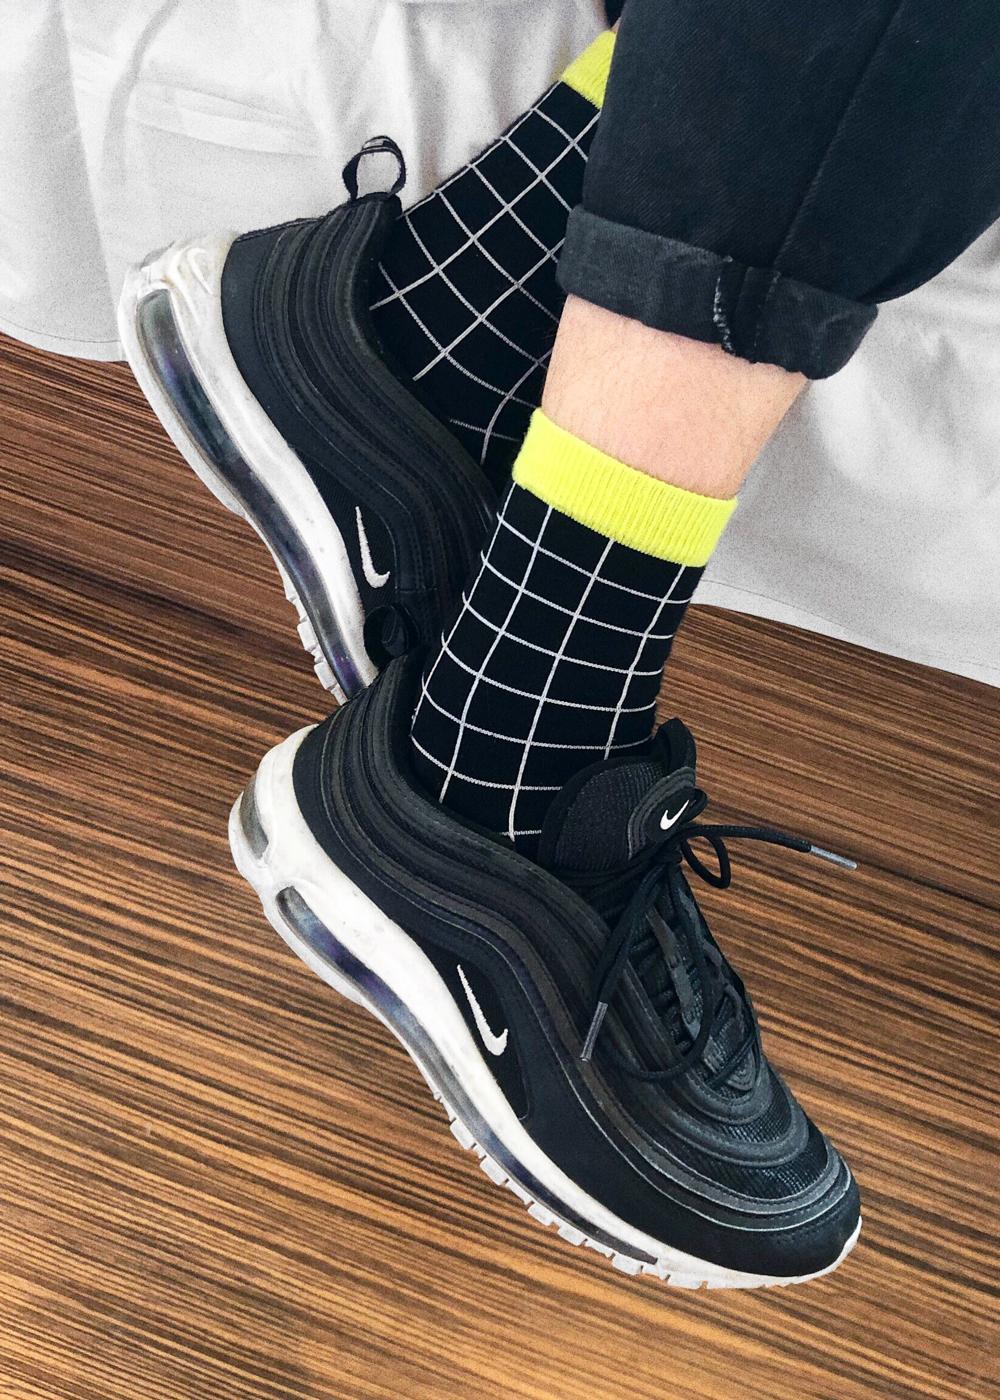 Socks_grid